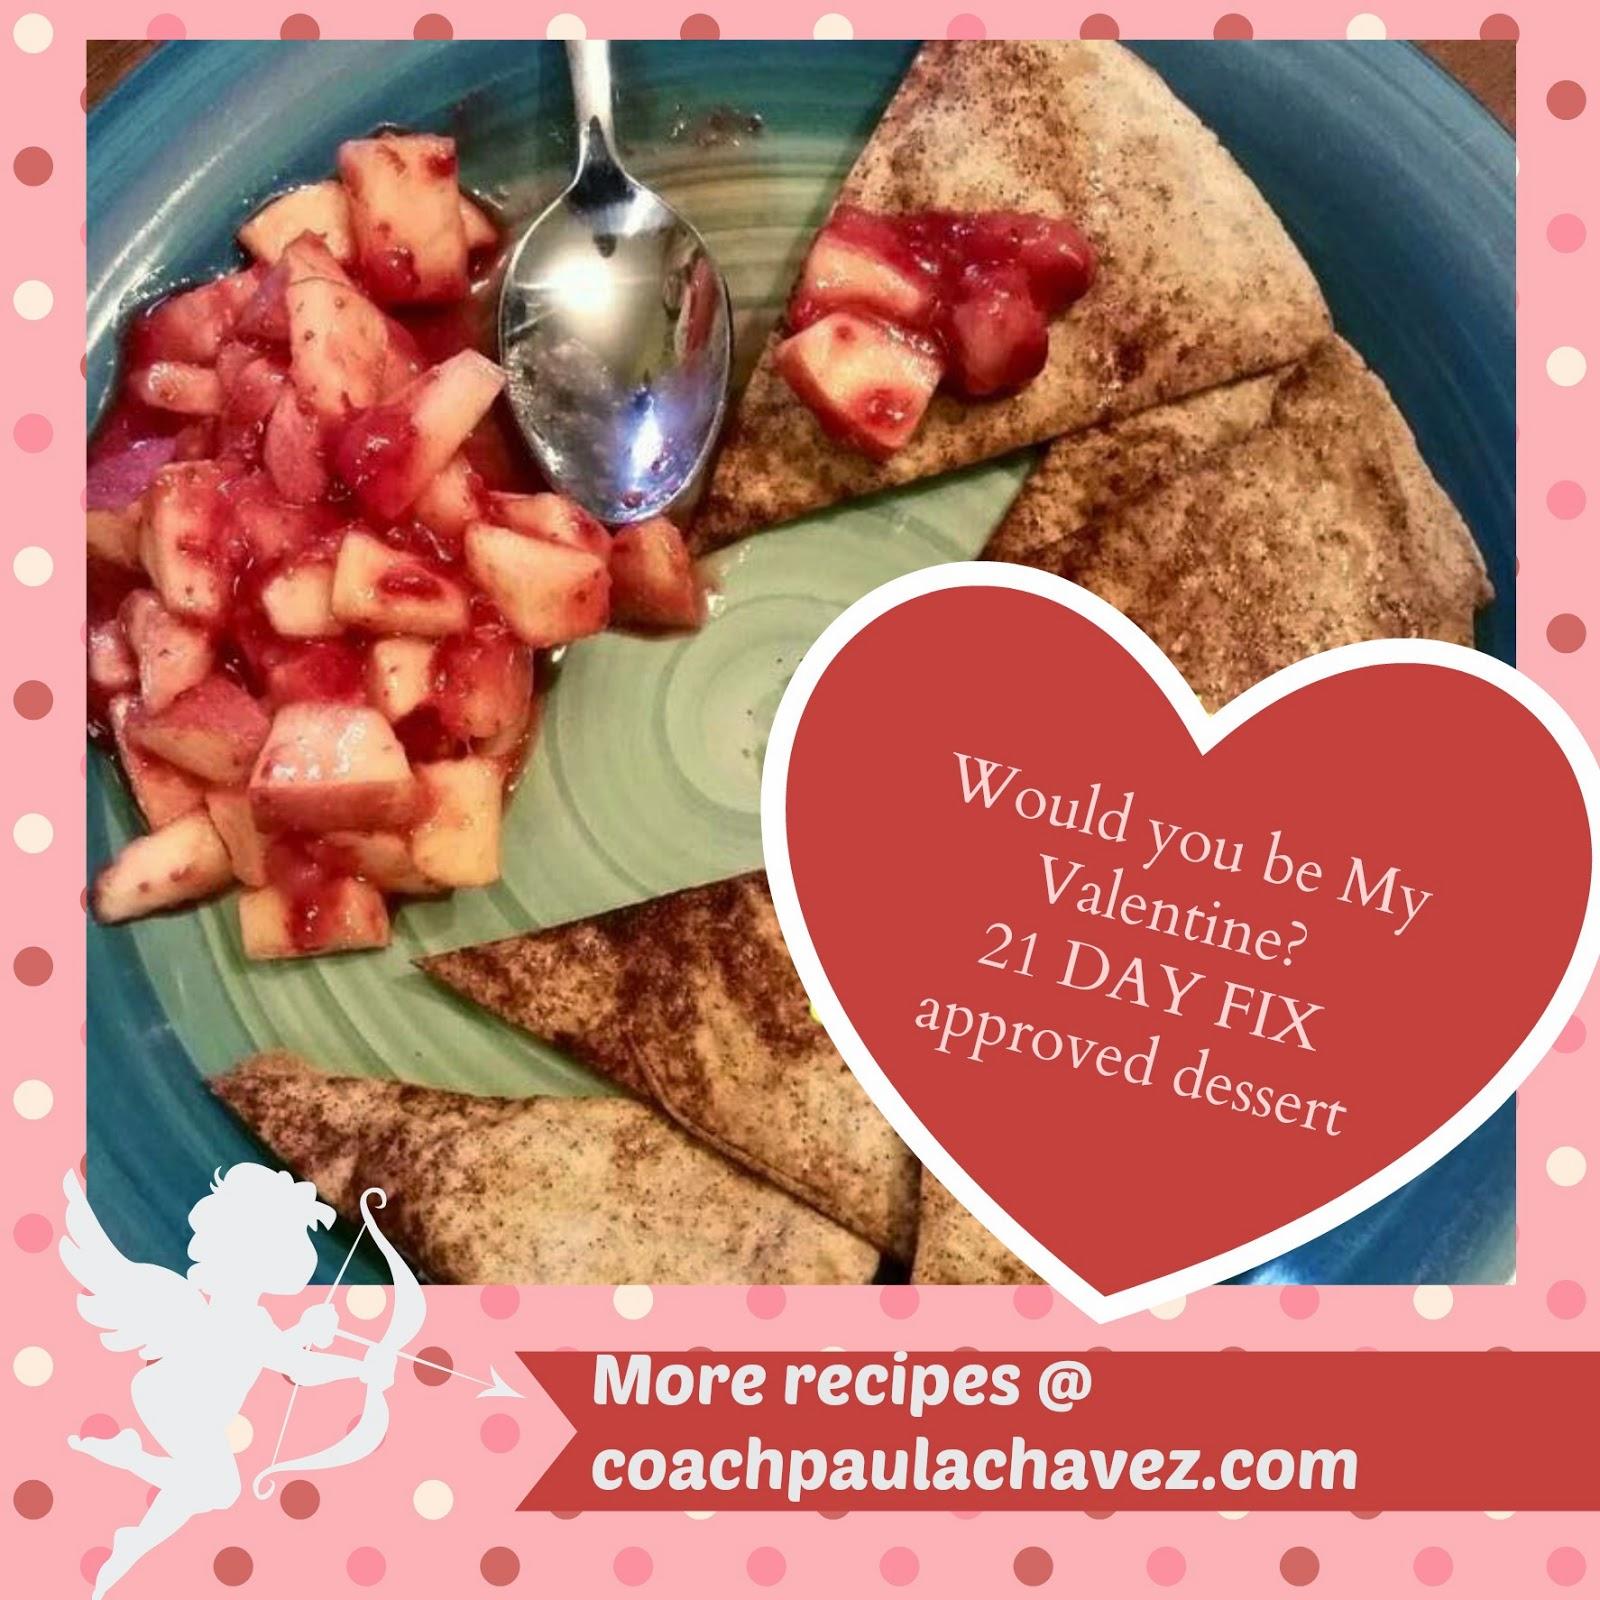 healthy dessert, clean eating recipes, 21 day fix approved, best coach, valentines day desserts, cinnamon chips, fruit salad, reto beachbody, entrenadora beachbody, coach paula chavez